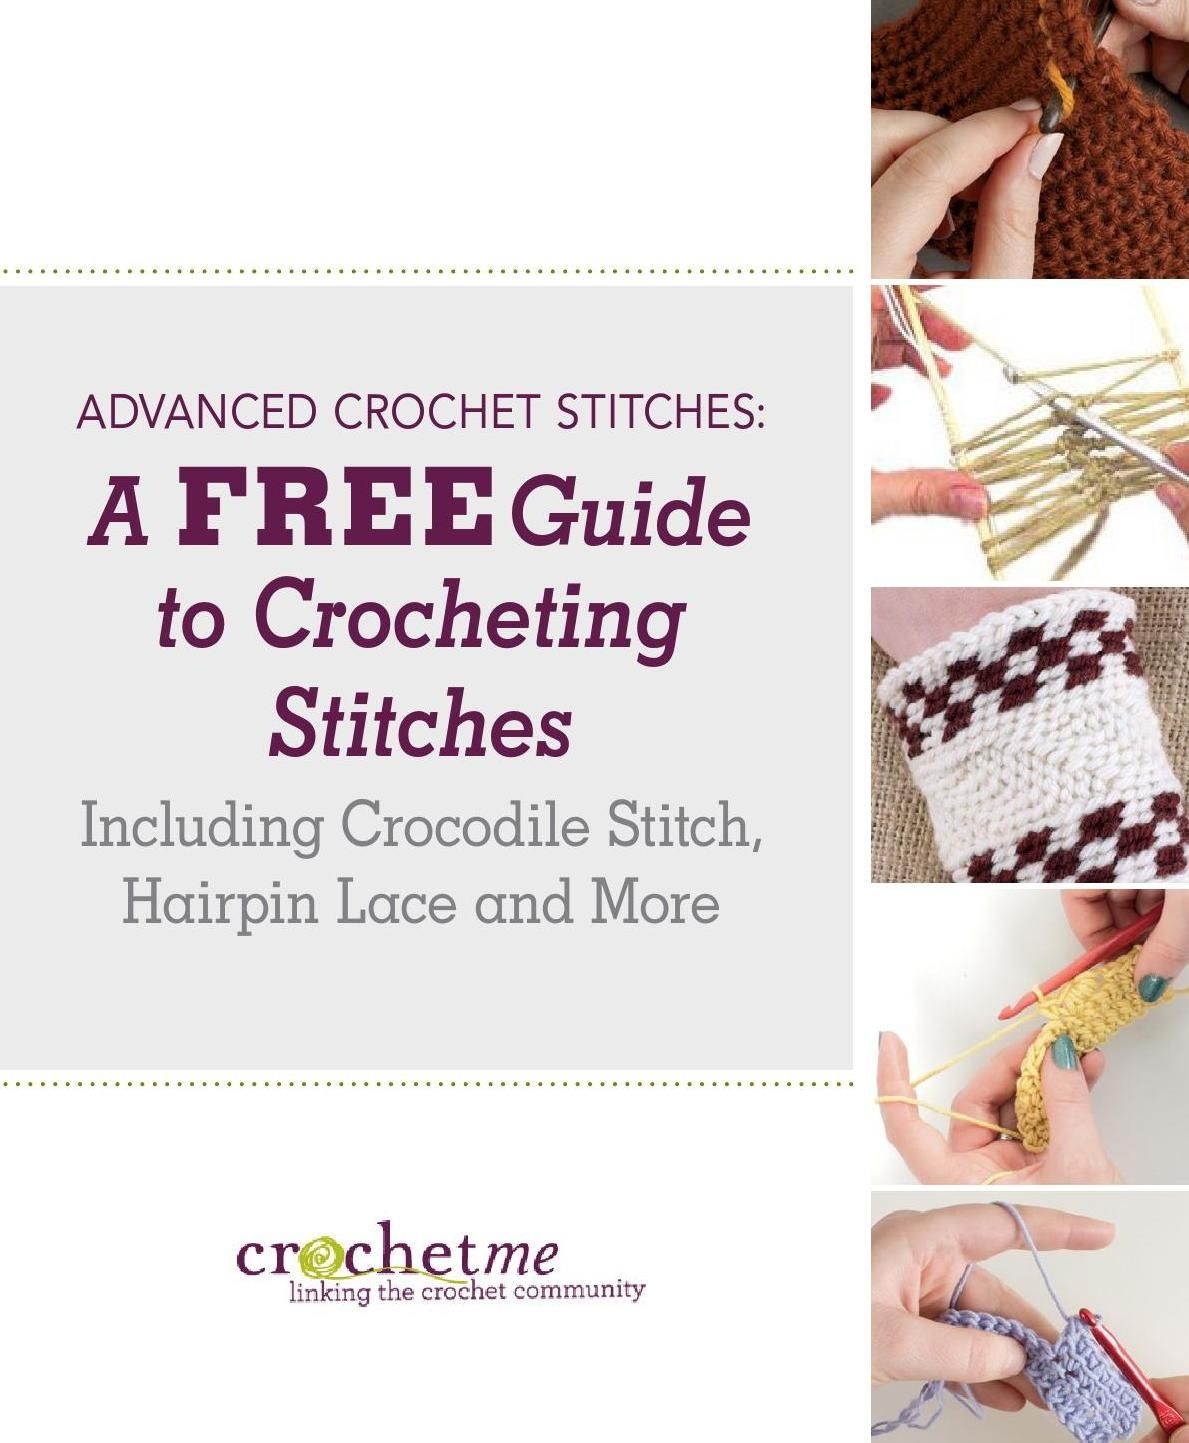 #ClippedOnIssuu from Advanced crochet stitches